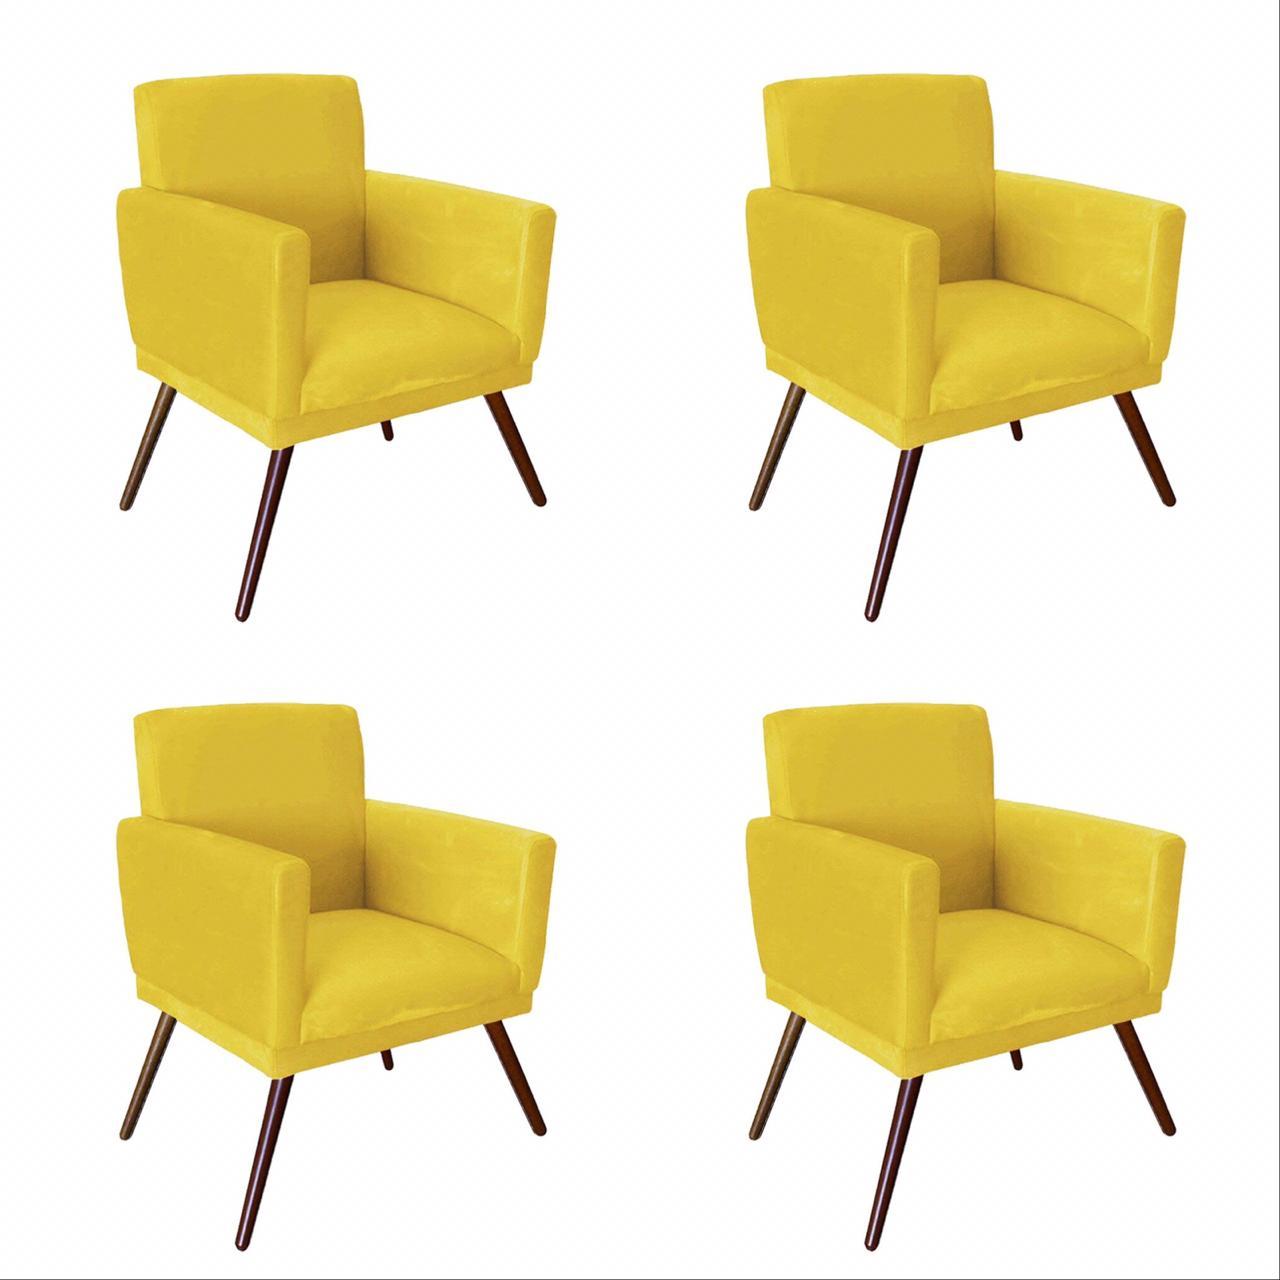 Kit 04 Poltrona Decorativa Nina Com Rodapé Suede Amarelo - Bela Casa Shop